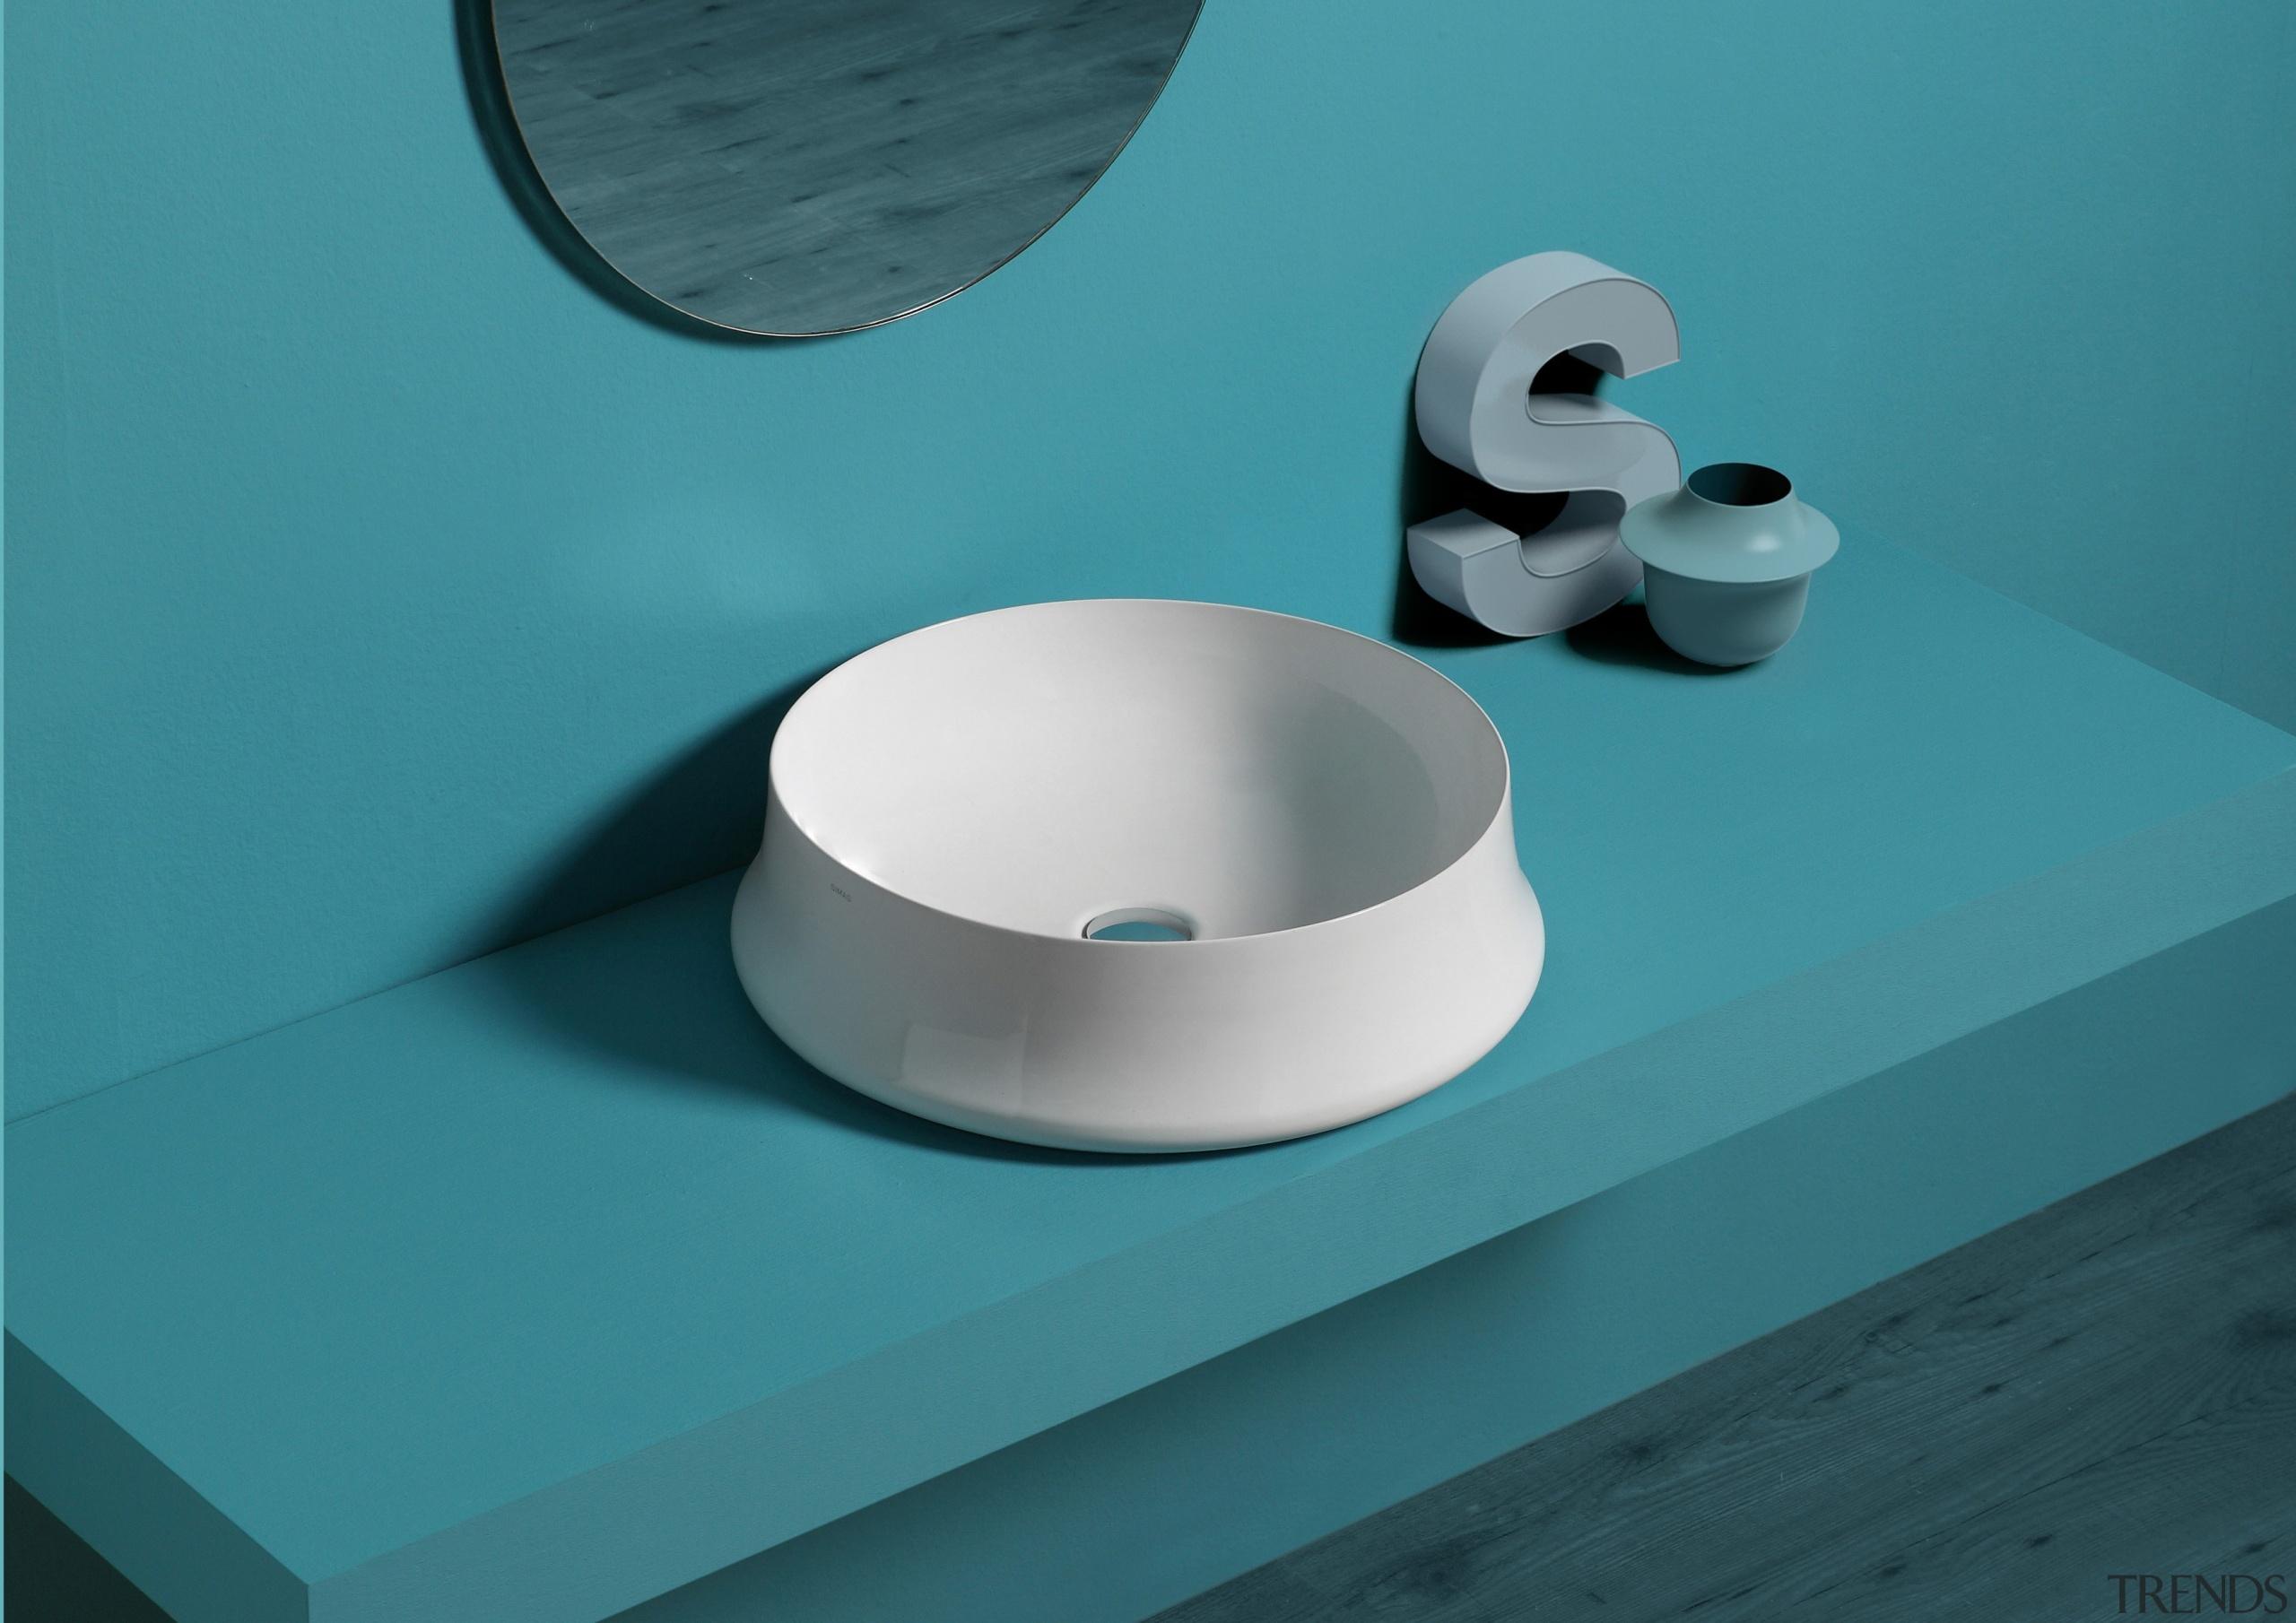 Trenz 03 - ceramic | plumbing fixture | ceramic, plumbing fixture, product, table, tap, teal